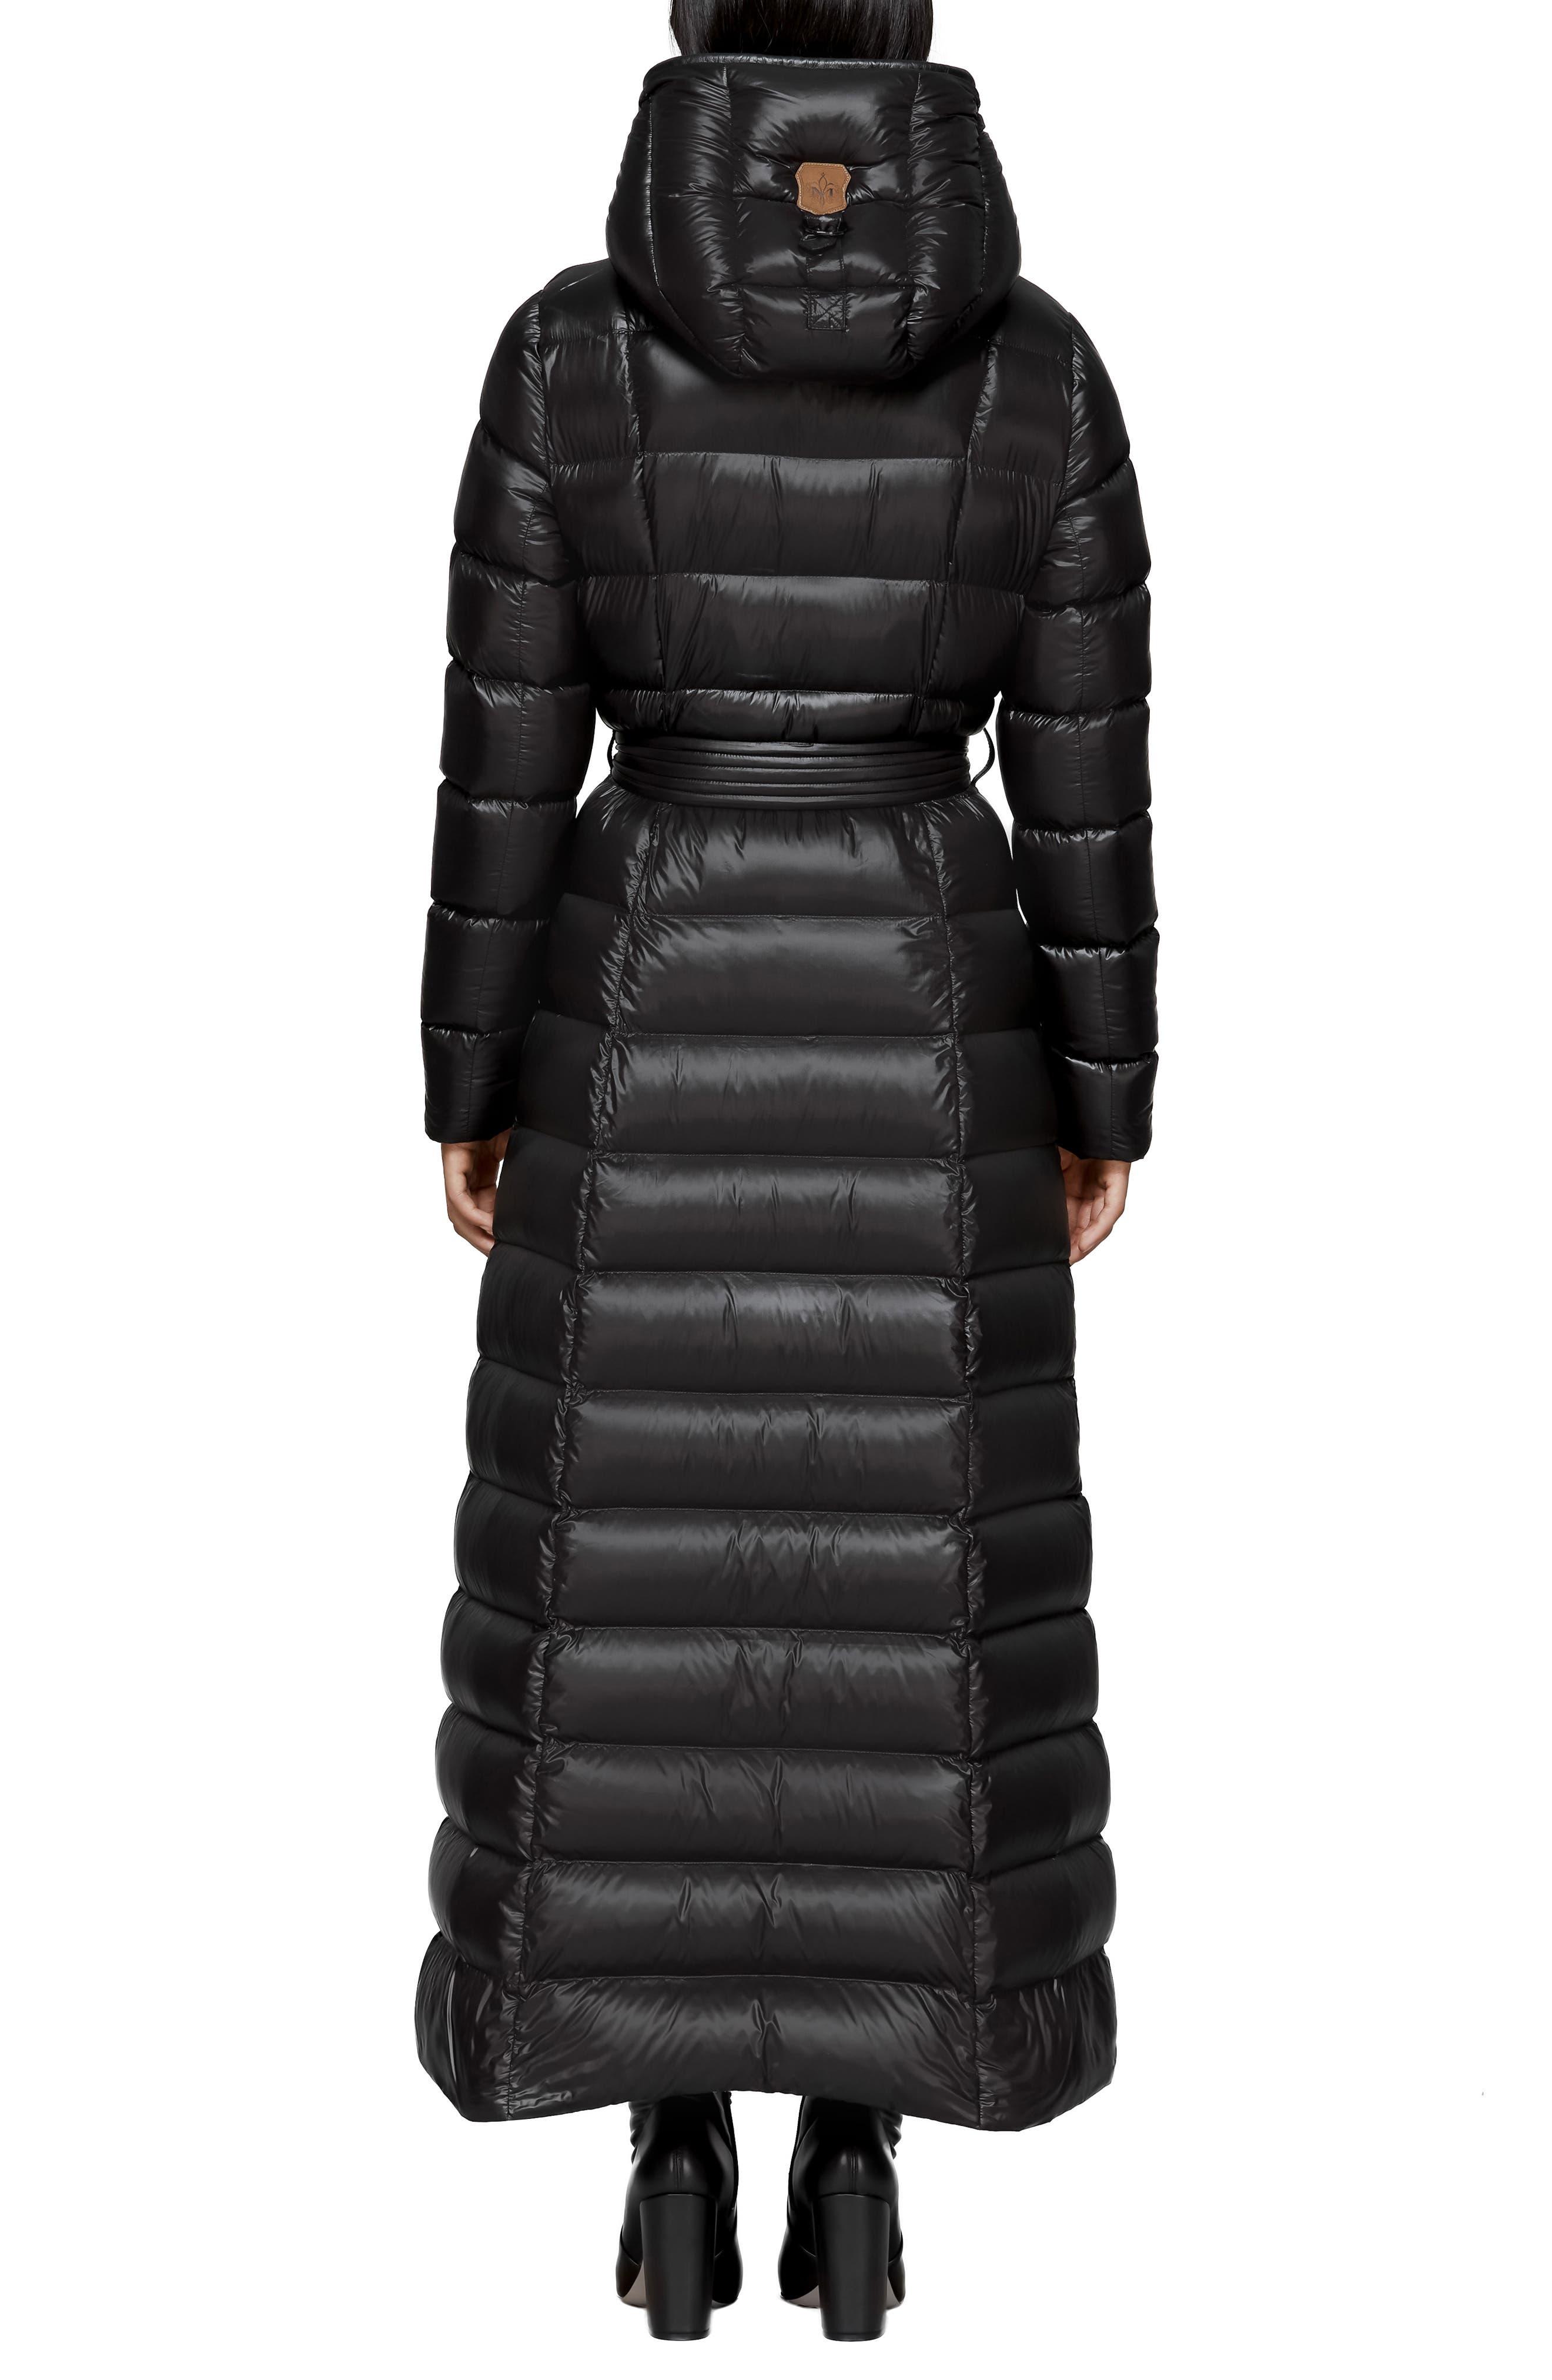 MACKAGE, Long Water Resistant Down Puffer Coat, Alternate thumbnail 2, color, BLACK